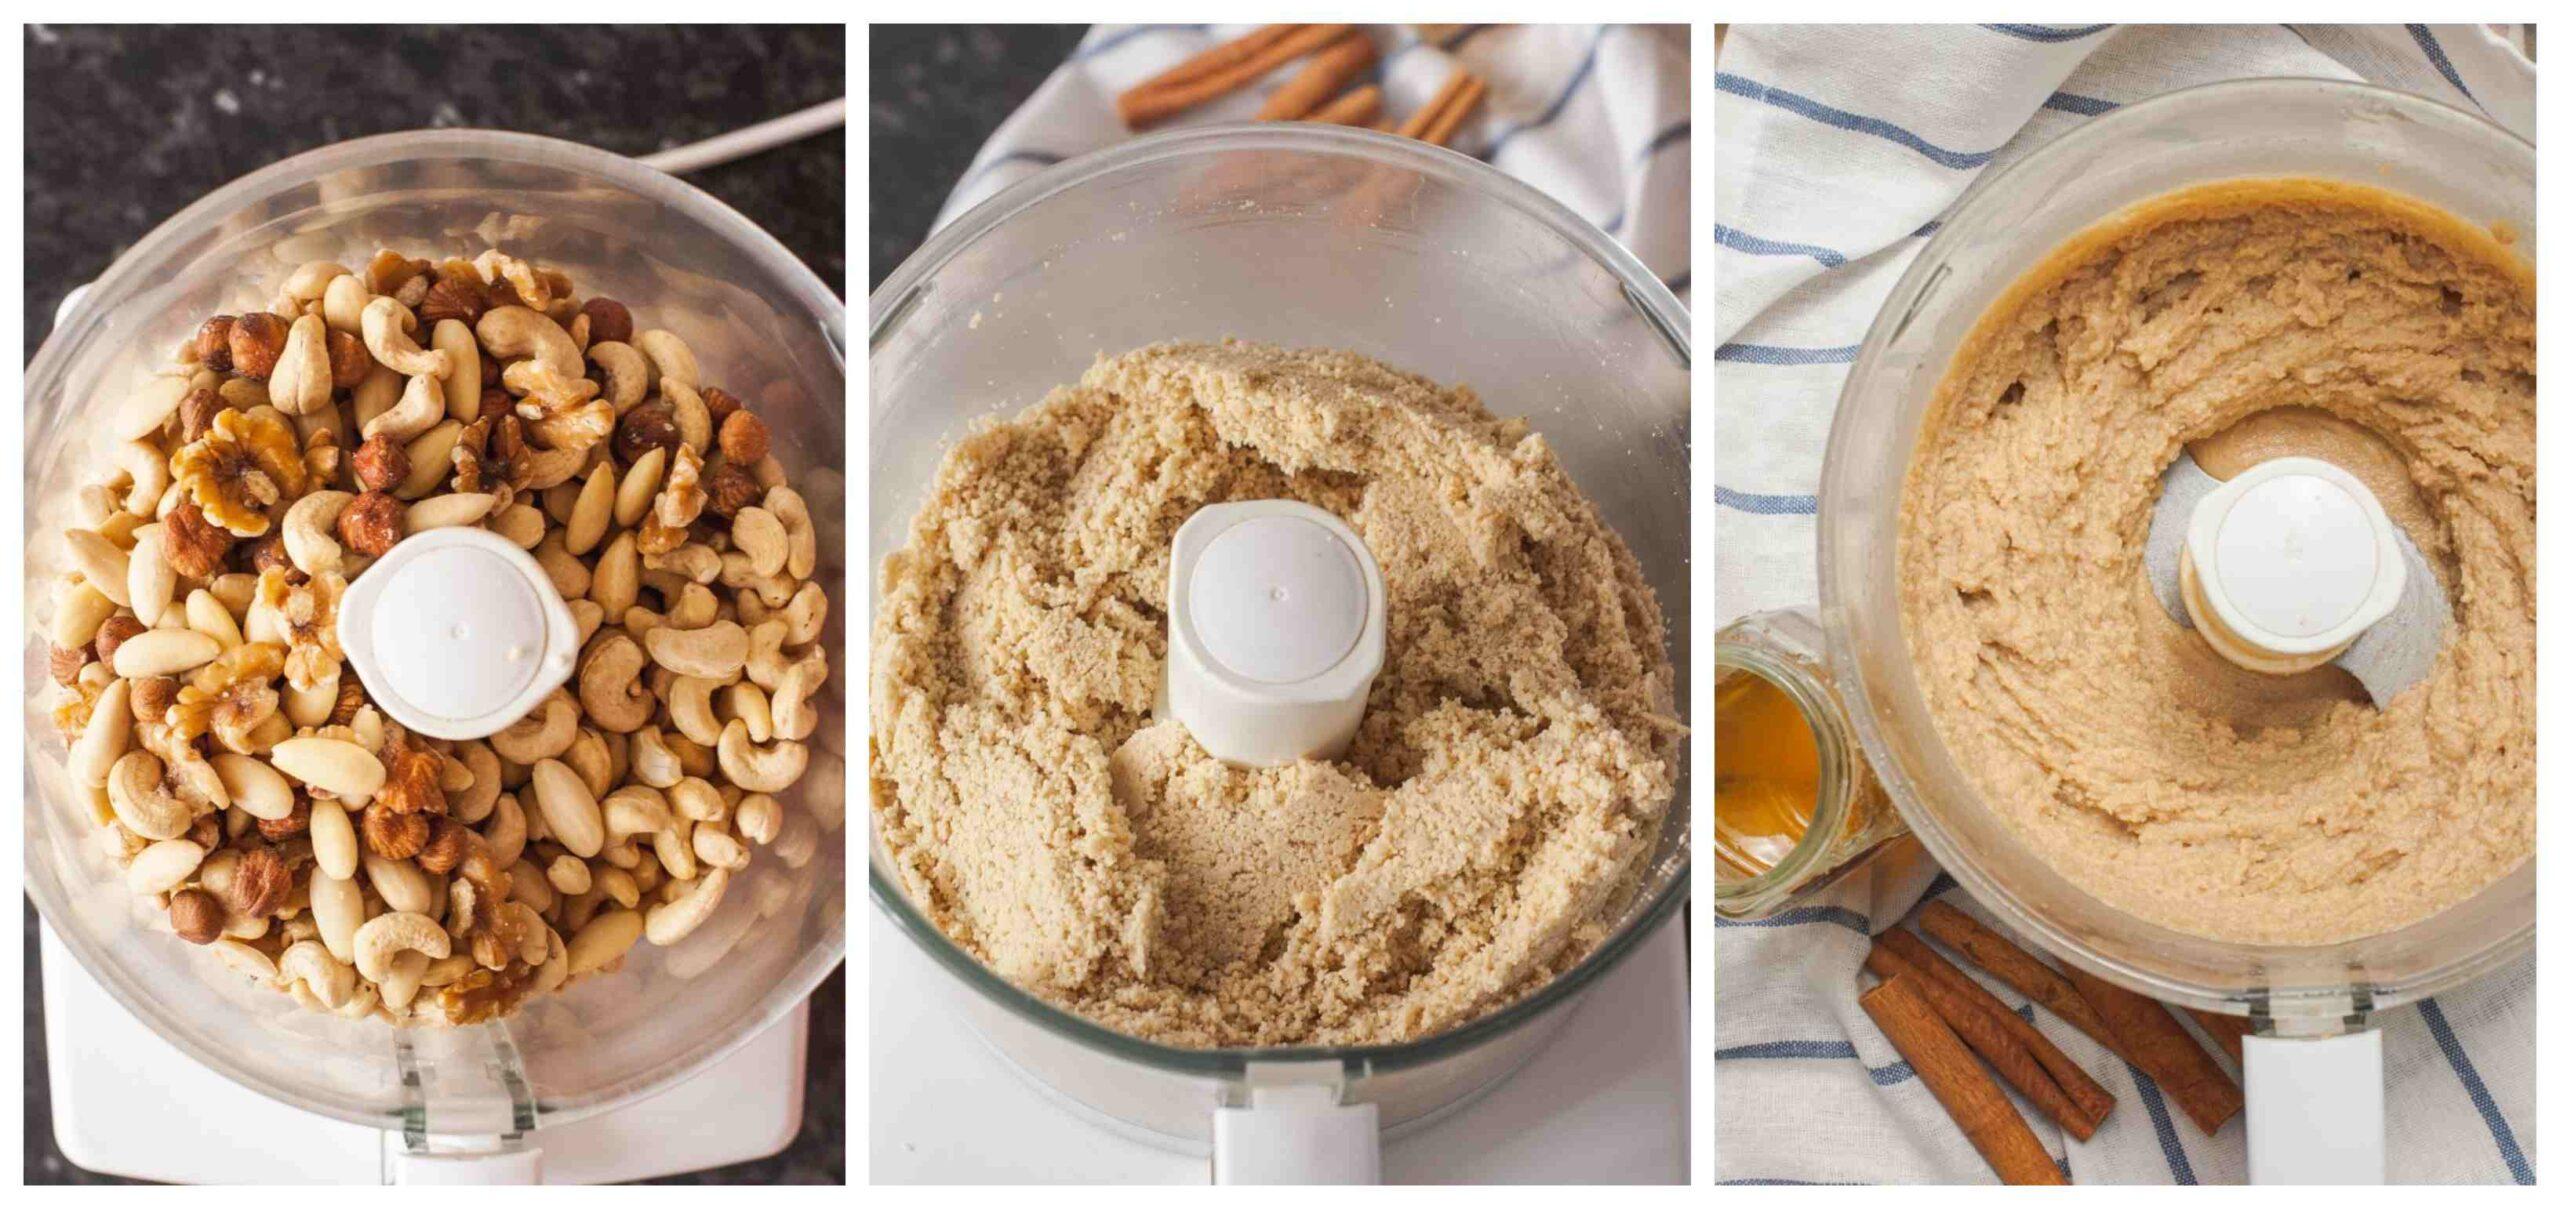 cashew butter making process